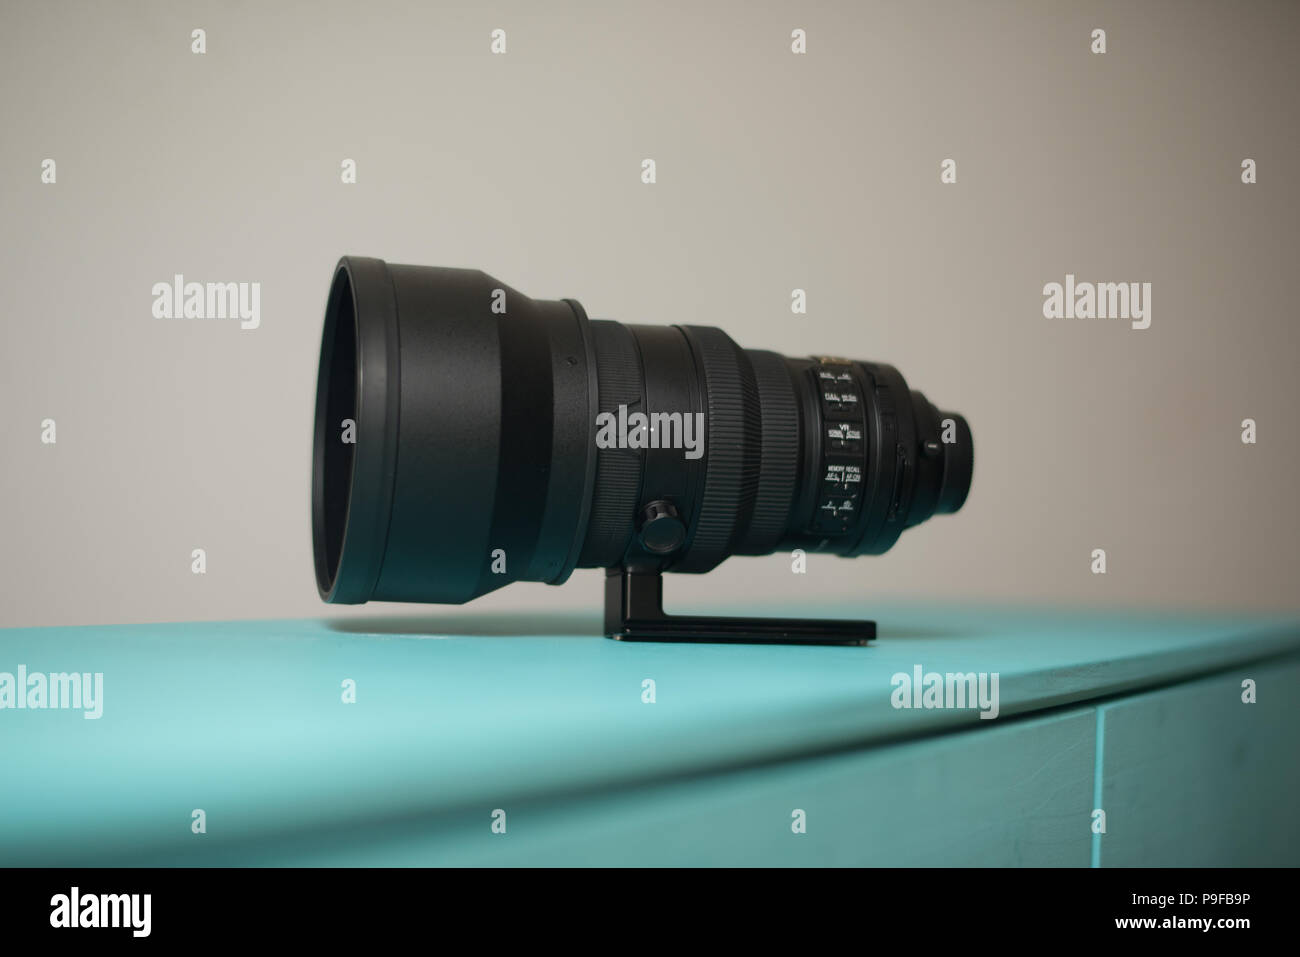 Nikon 200mm f/2 vr ii telephoto lens - Stock Image